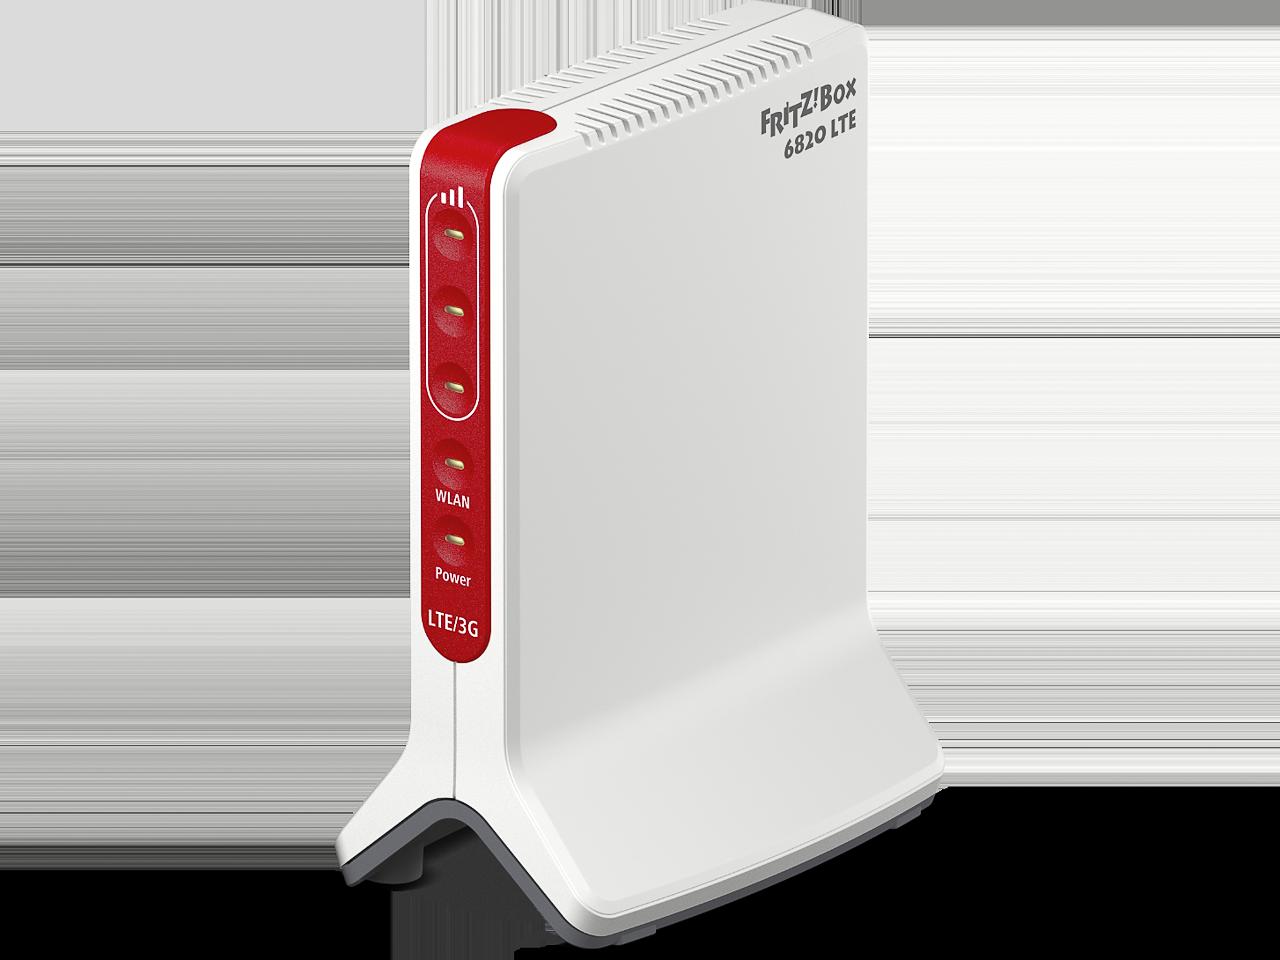 AVM FRITZ!BOX 6820 LTE ROUTER 20002906 450Mbits/WLAN N 1